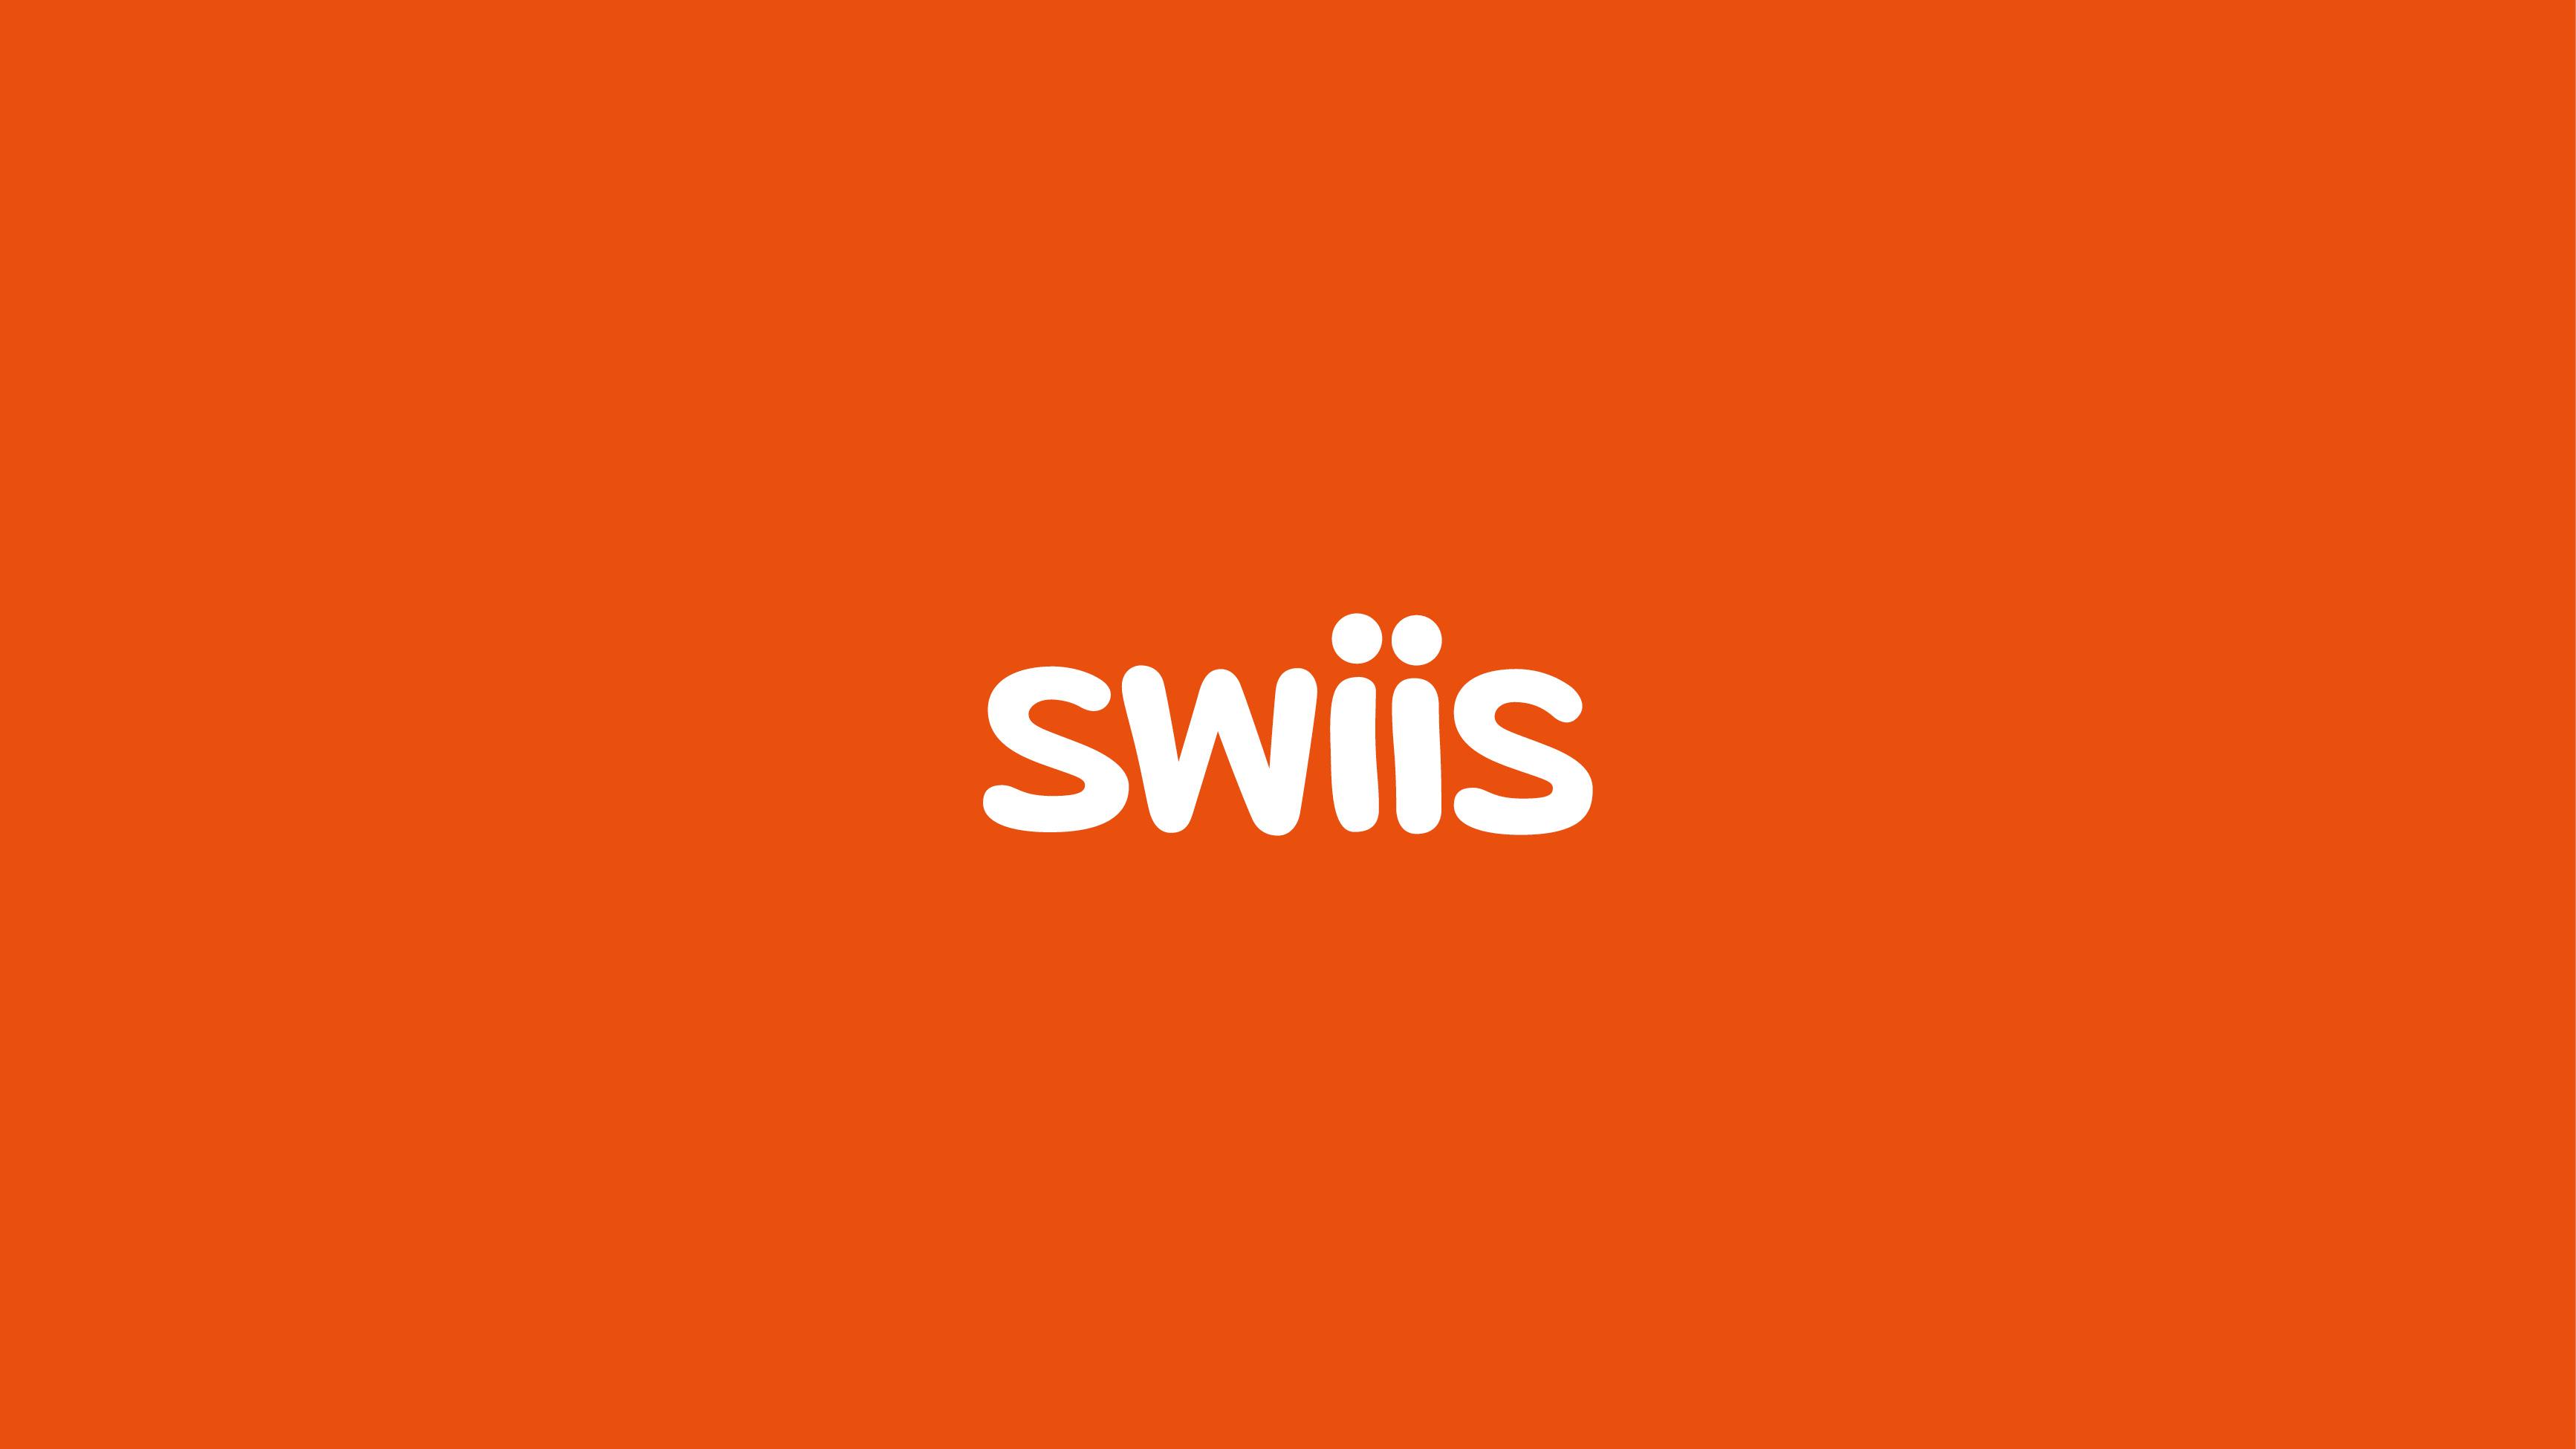 Swiis Charity